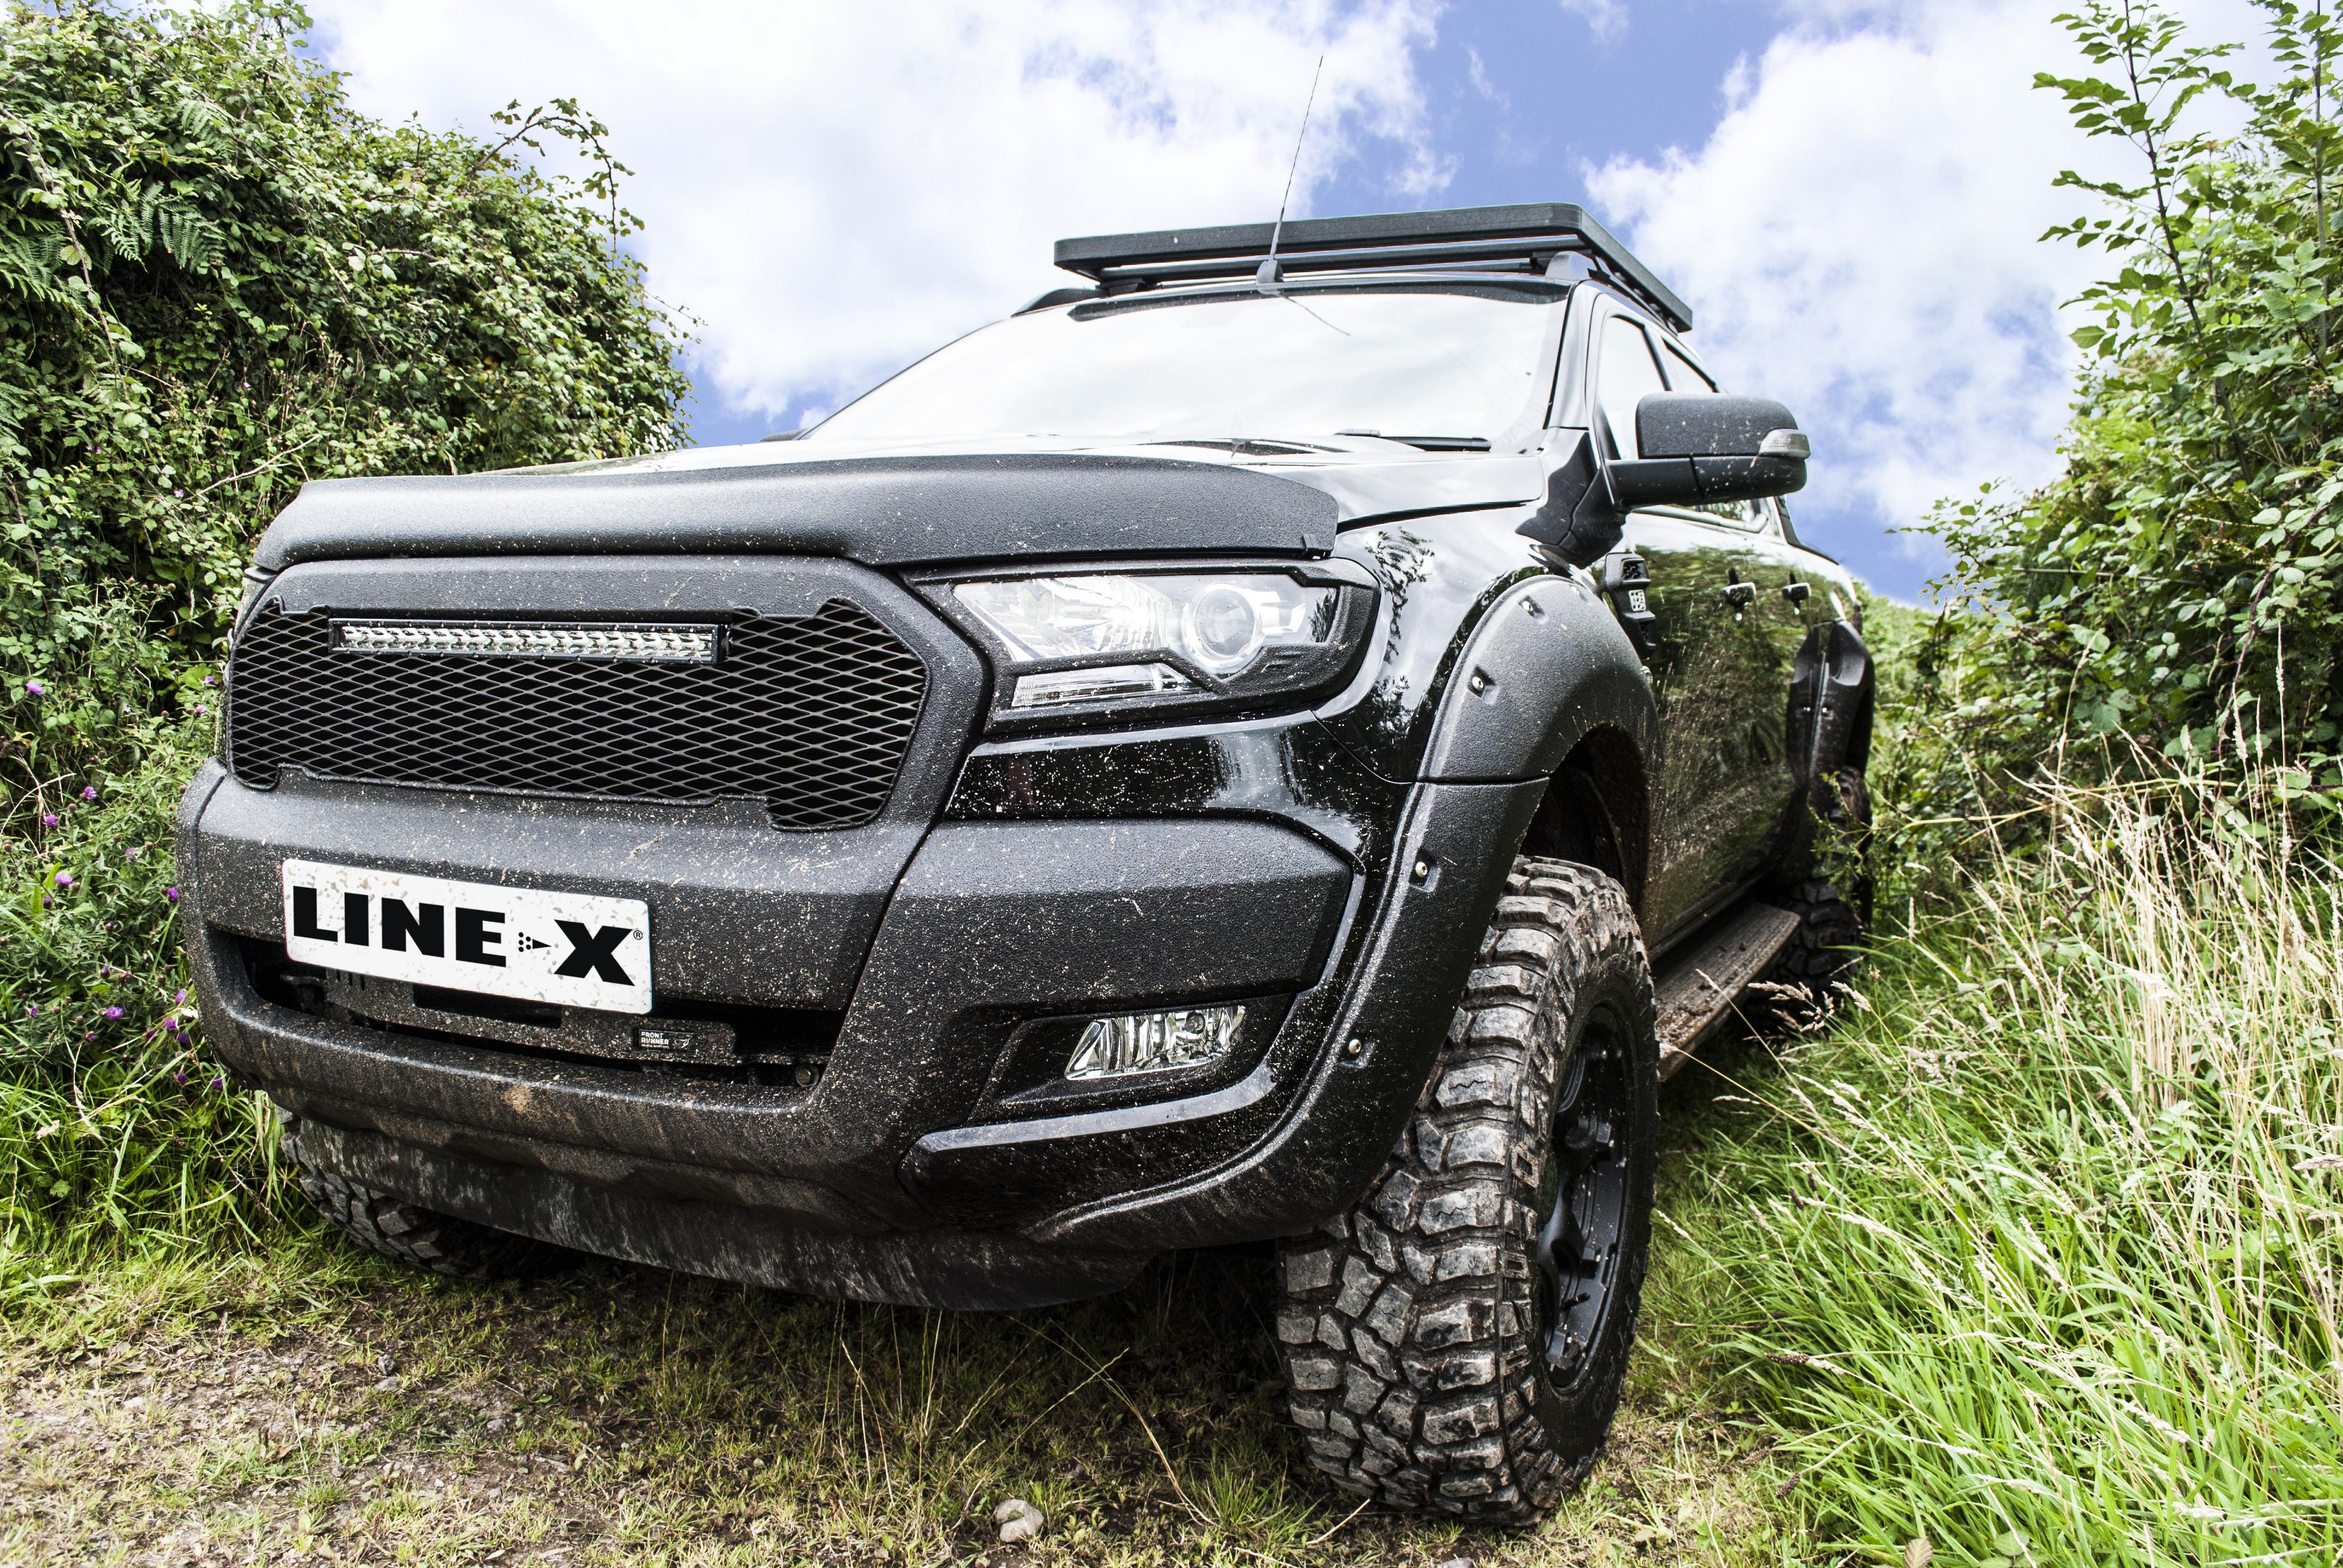 line-x-truck-uk